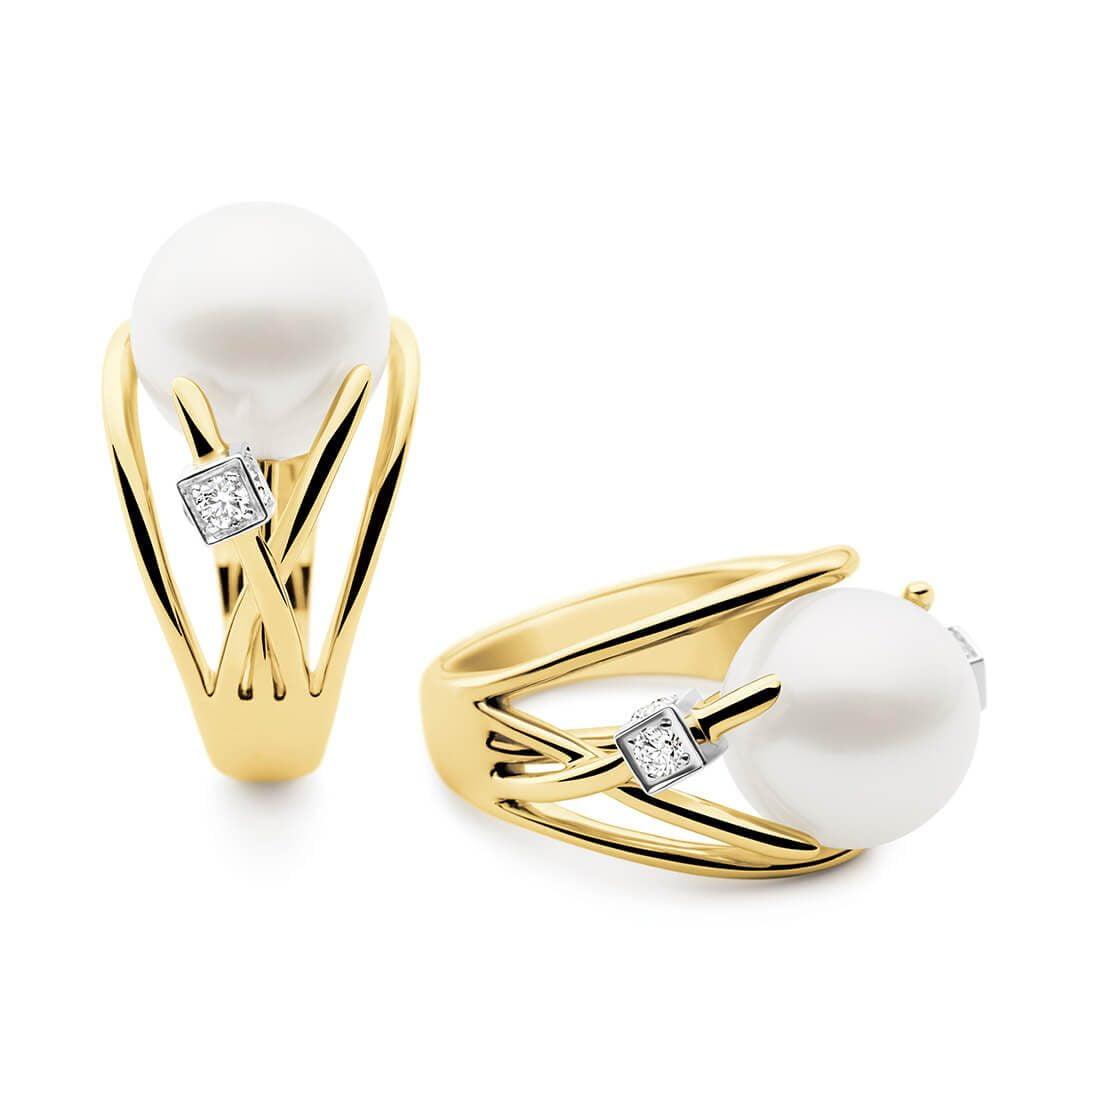 Kailis - Ethereal Orbit Ring, Yellow Gold